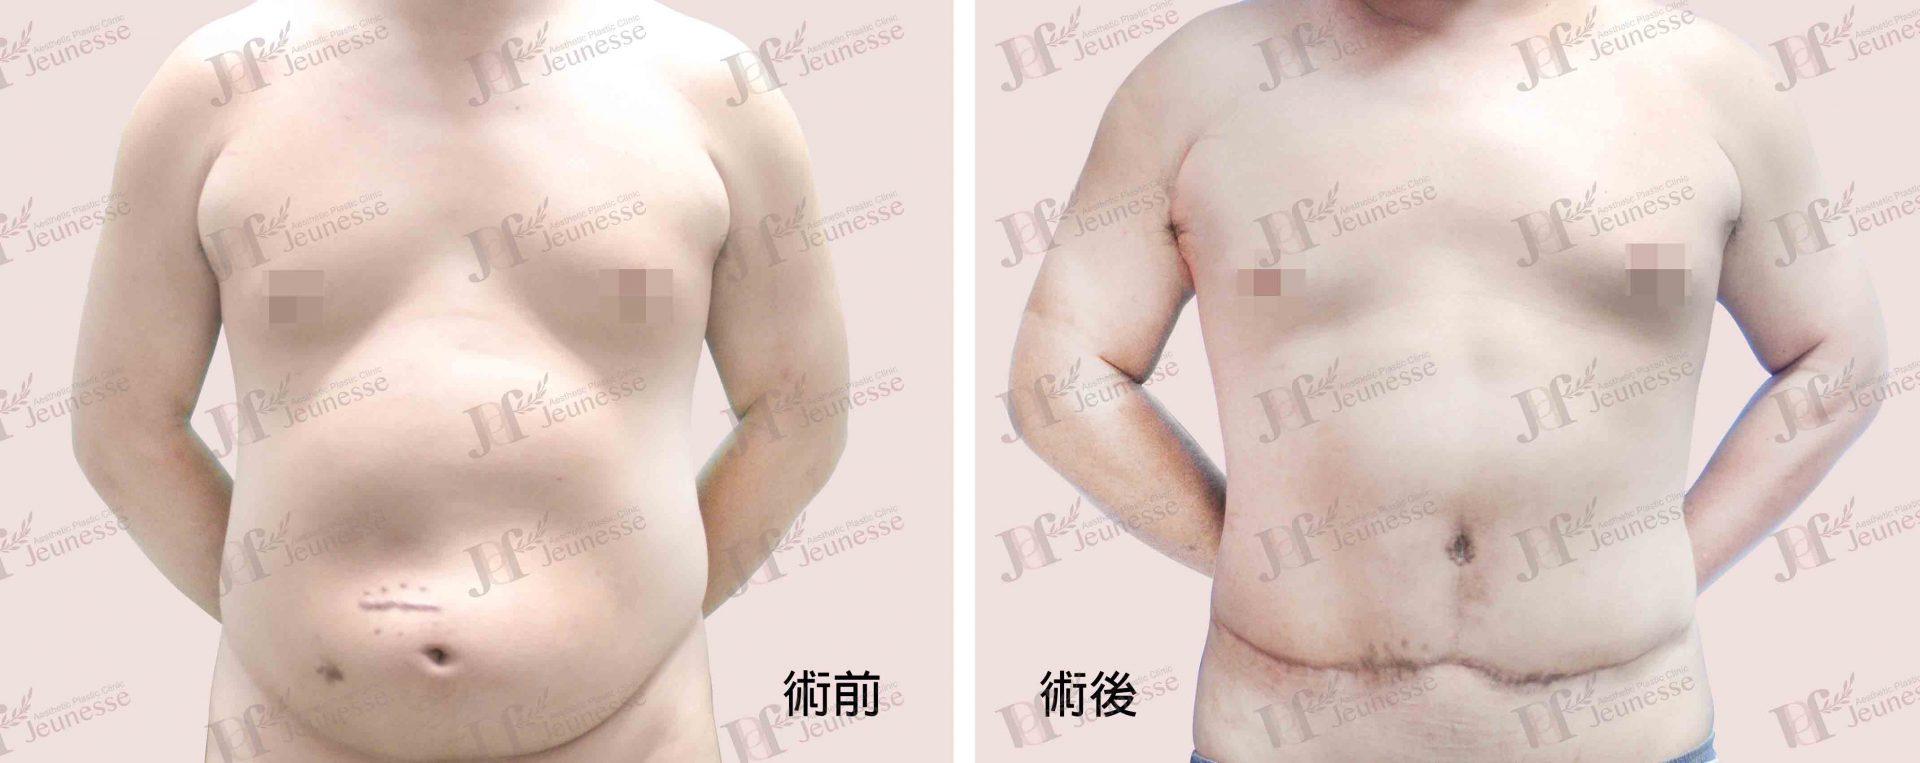 Abdominoplasty腹部成形術及抽脂手術 case 2 正面-浮水印